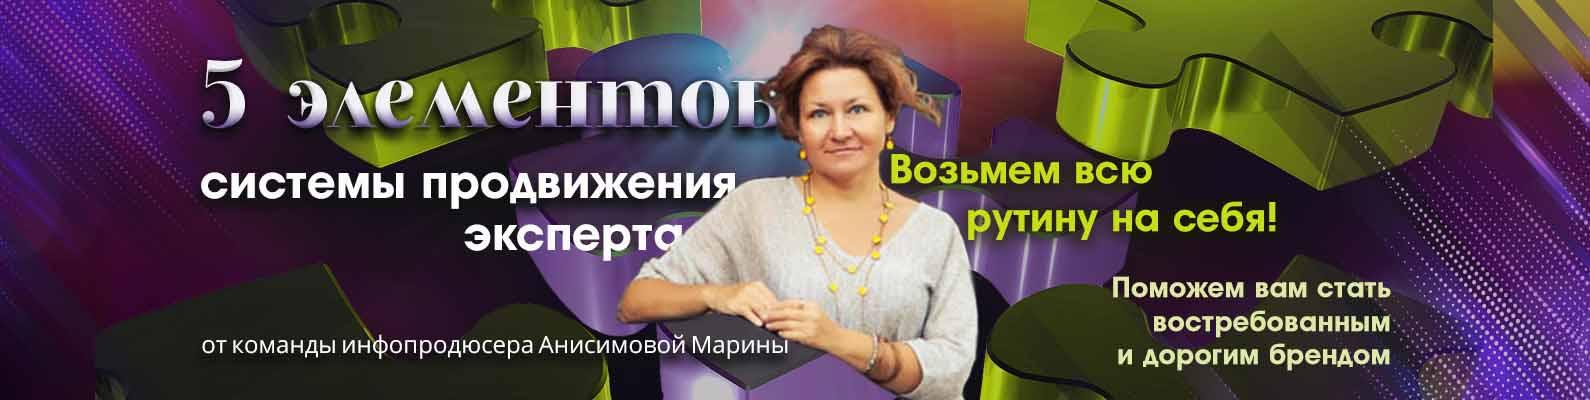 Марина Анисимова баннер